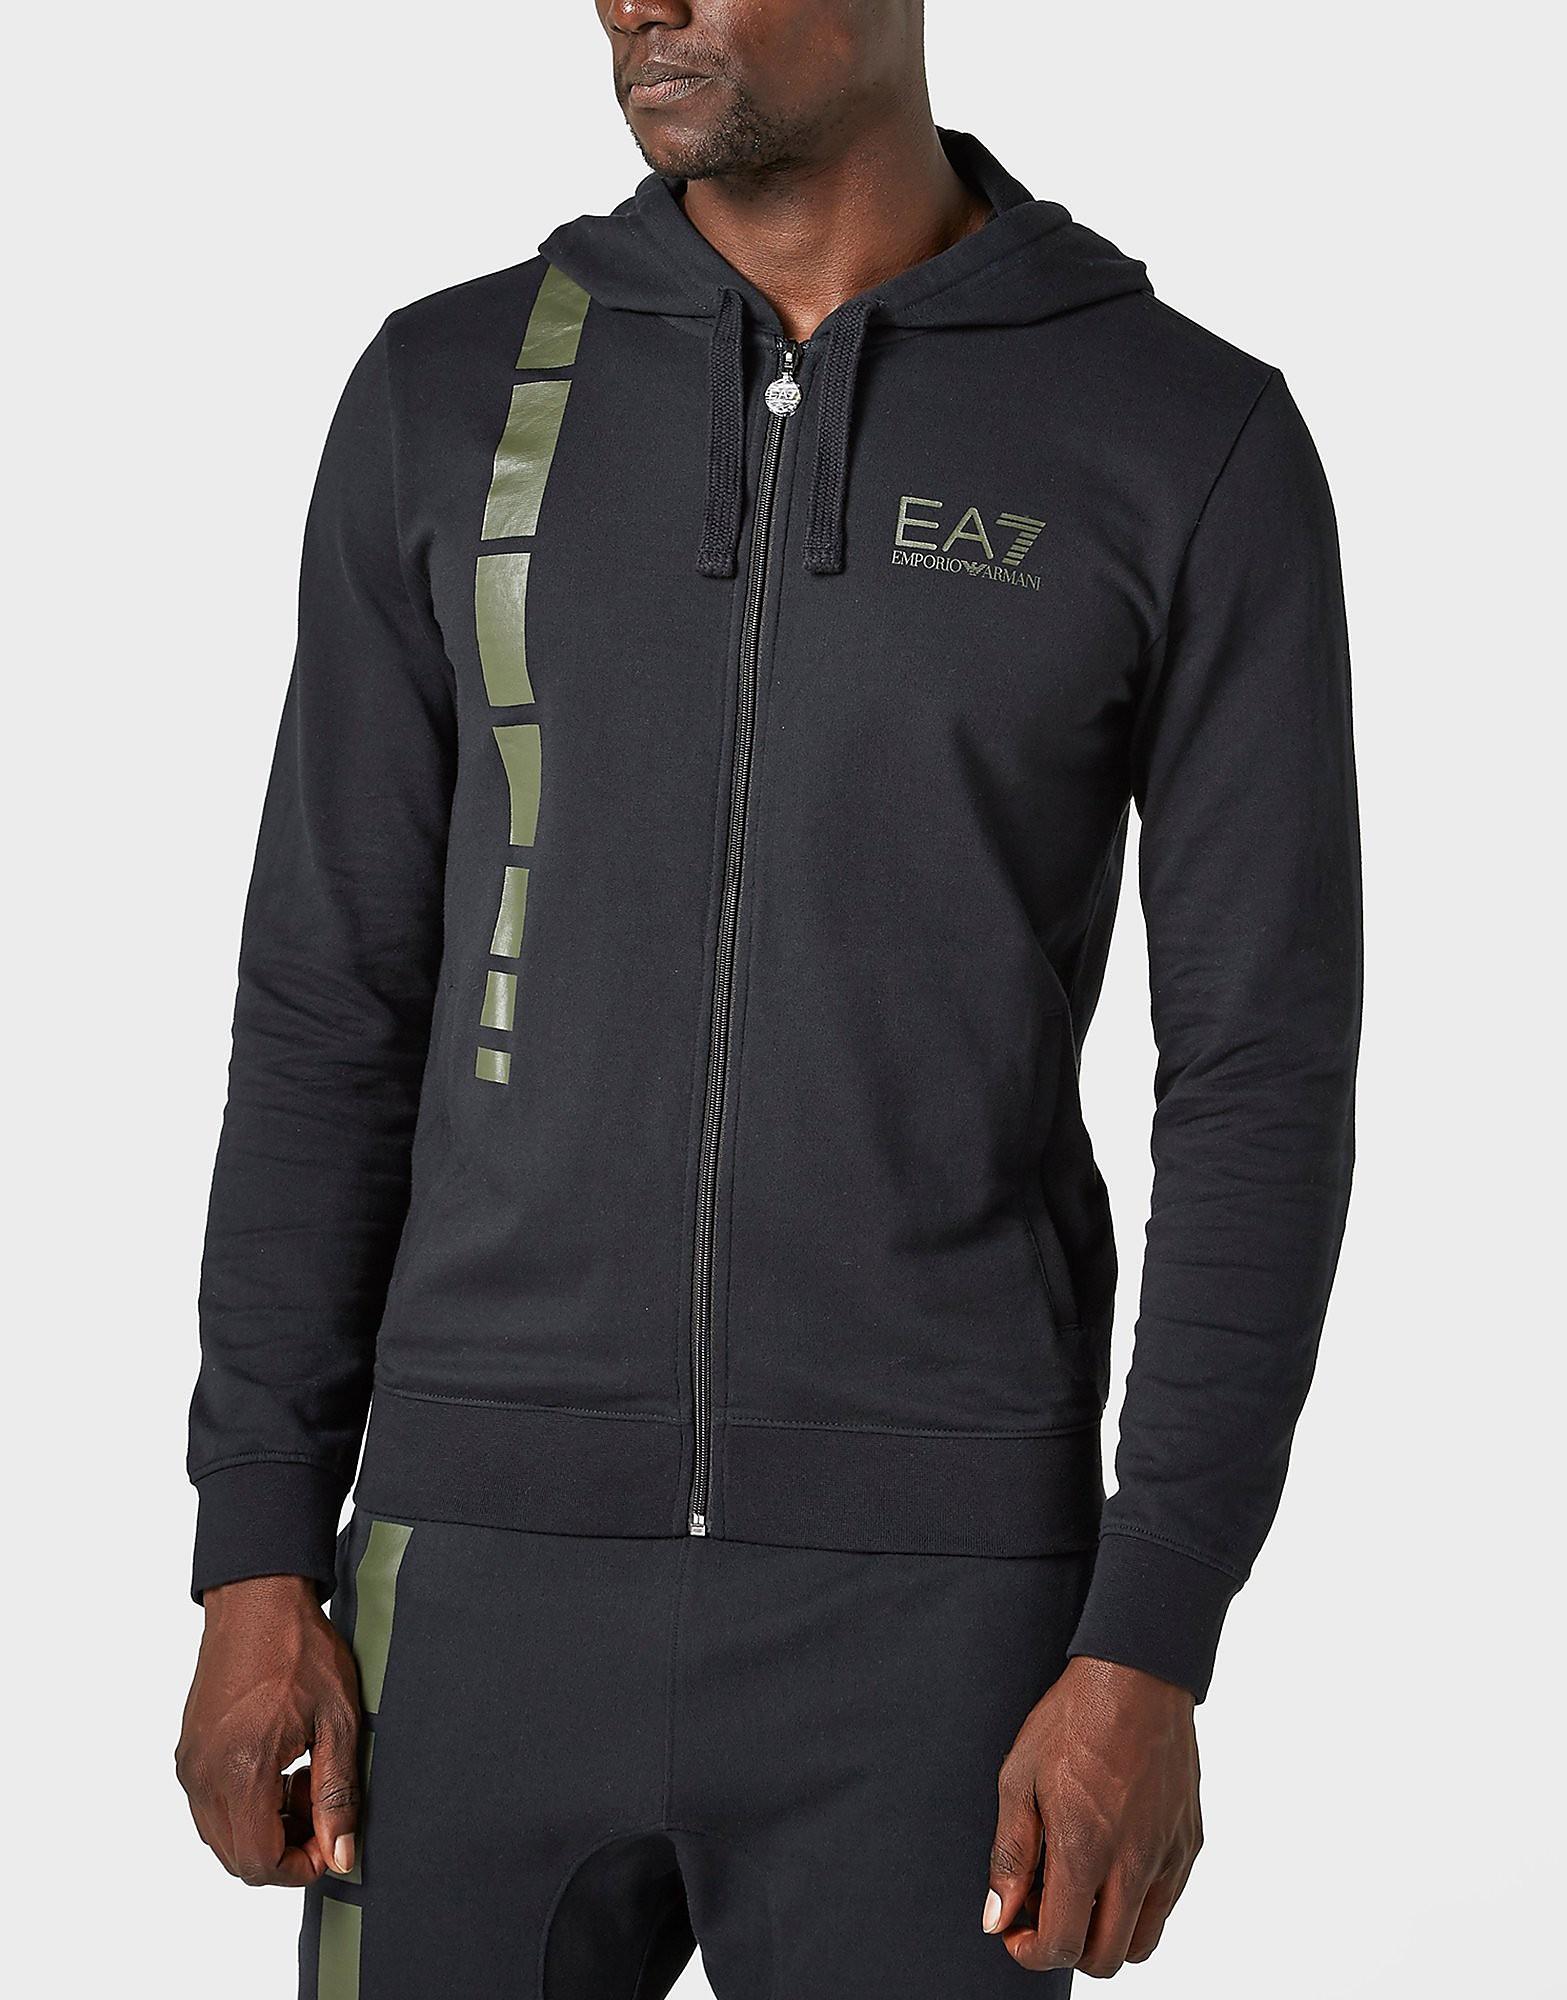 Emporio Armani EA7 7 Lines Full Zip Hoody